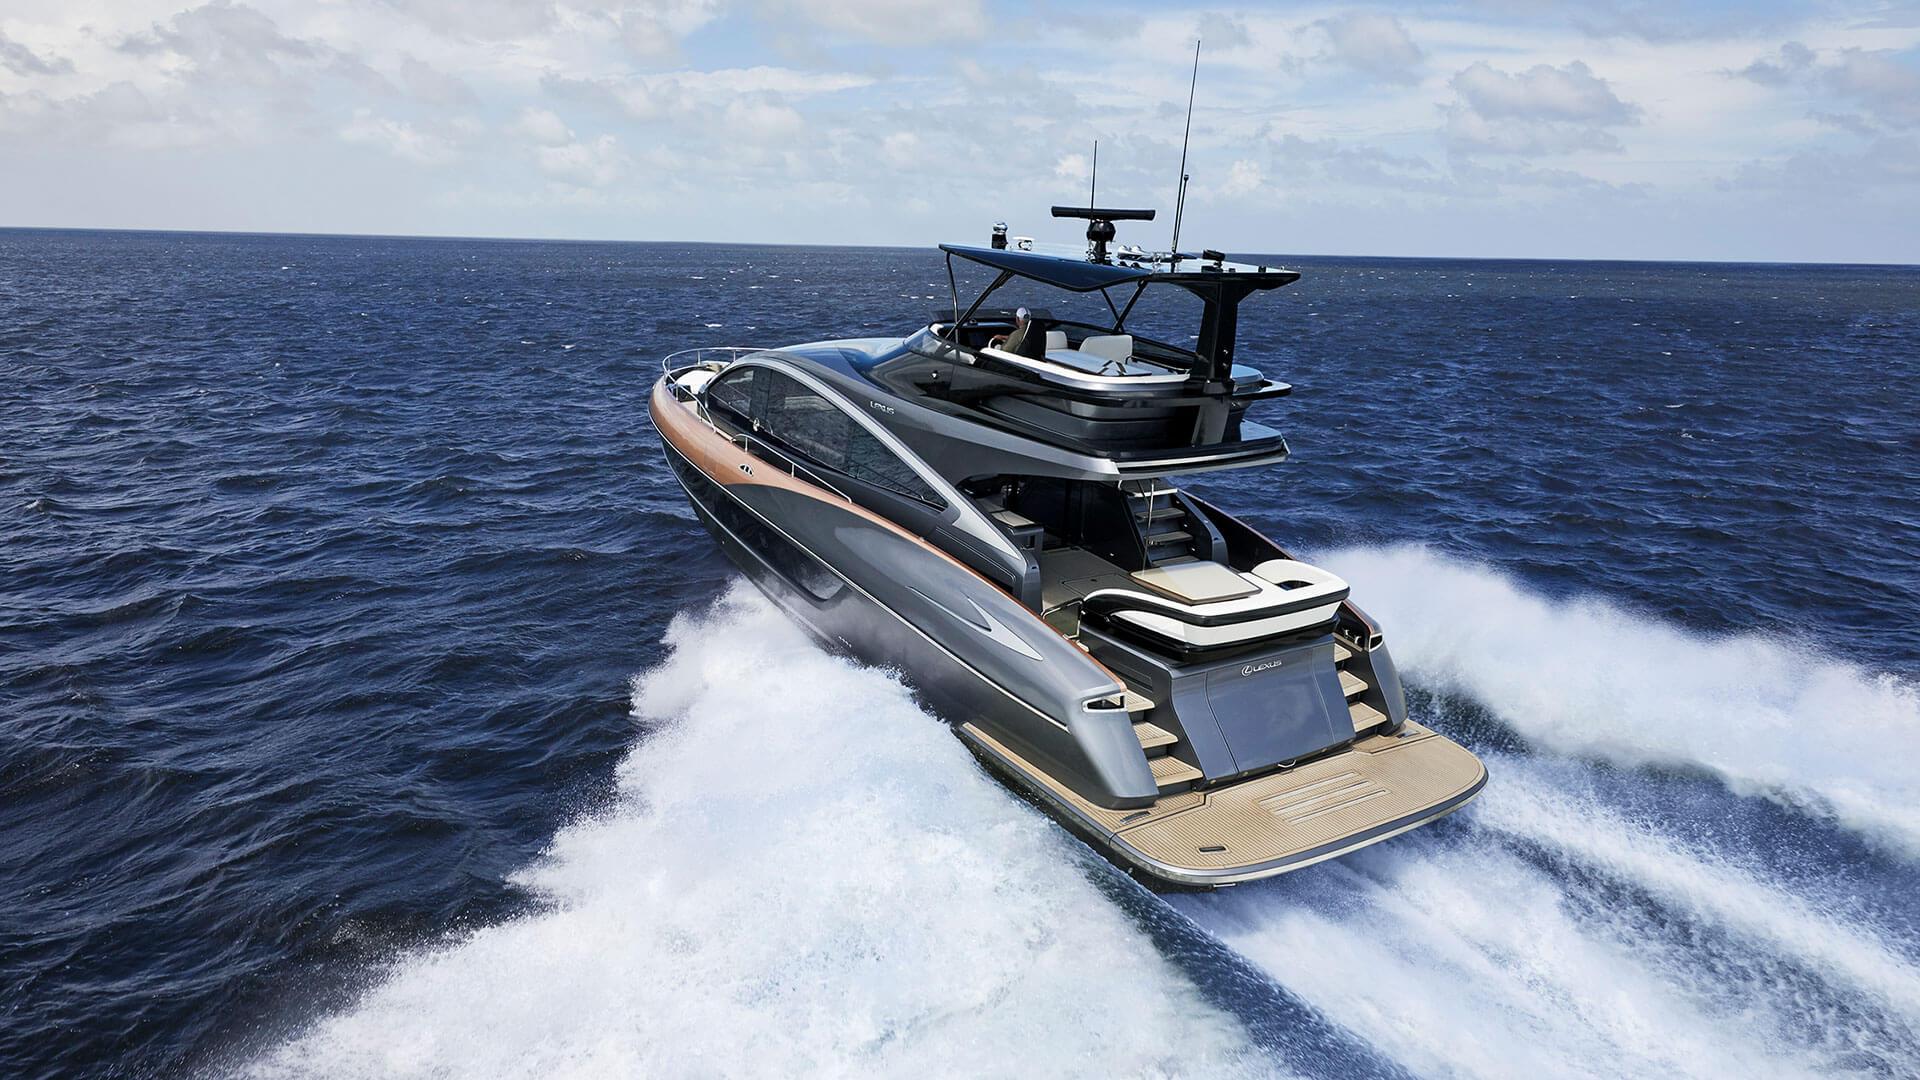 2020 lexus yacht ly 650 premiere gallery 03